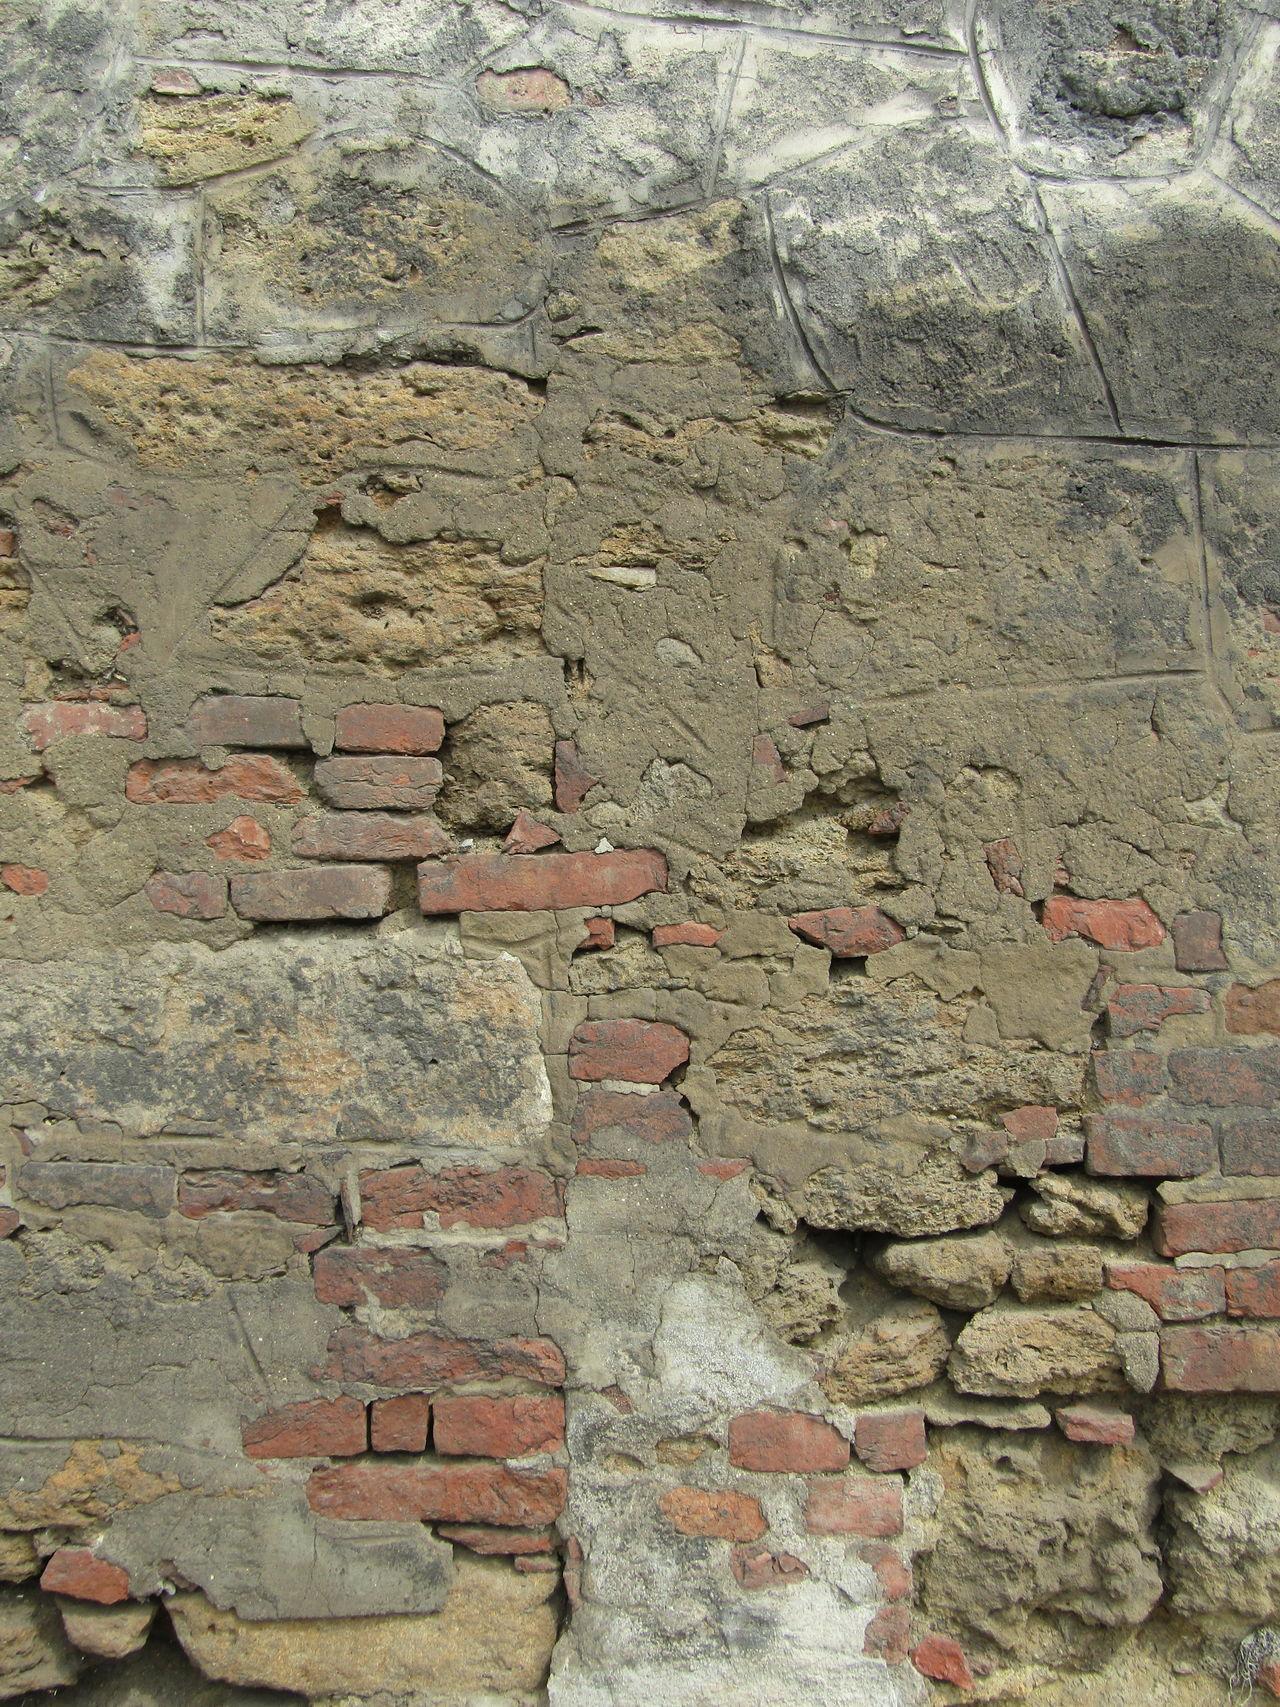 Textured  Verfallene Mauer Brick Wall Brick Ziegel Abandoned Mauer Wall Vienna Wien Weathered Full Frame Pattern Backgrounds Architecture